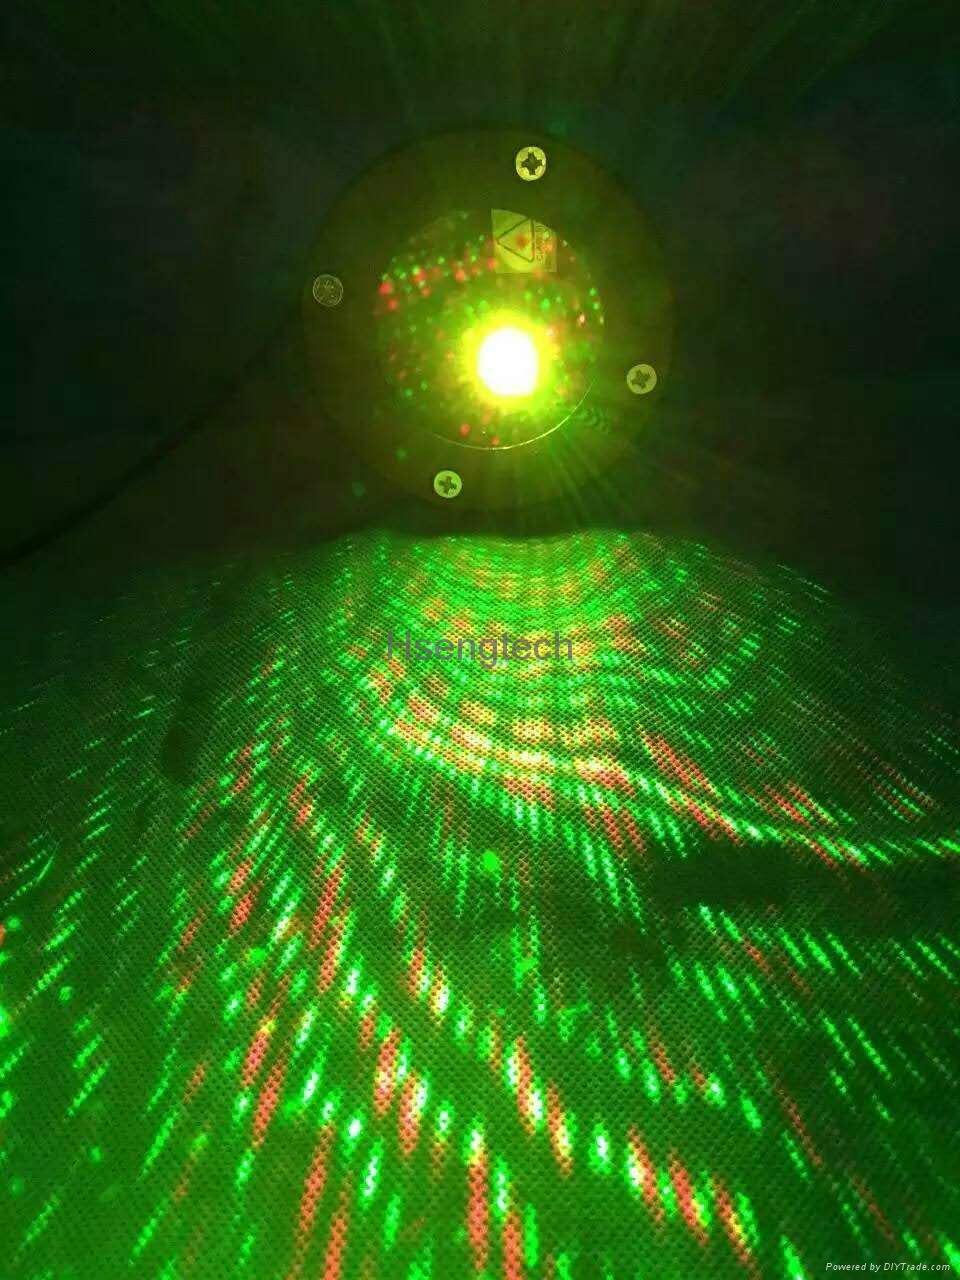 Waterproof Laser Stage Lights Red Green Projector Garden Lawn Lamps Outdoor 8